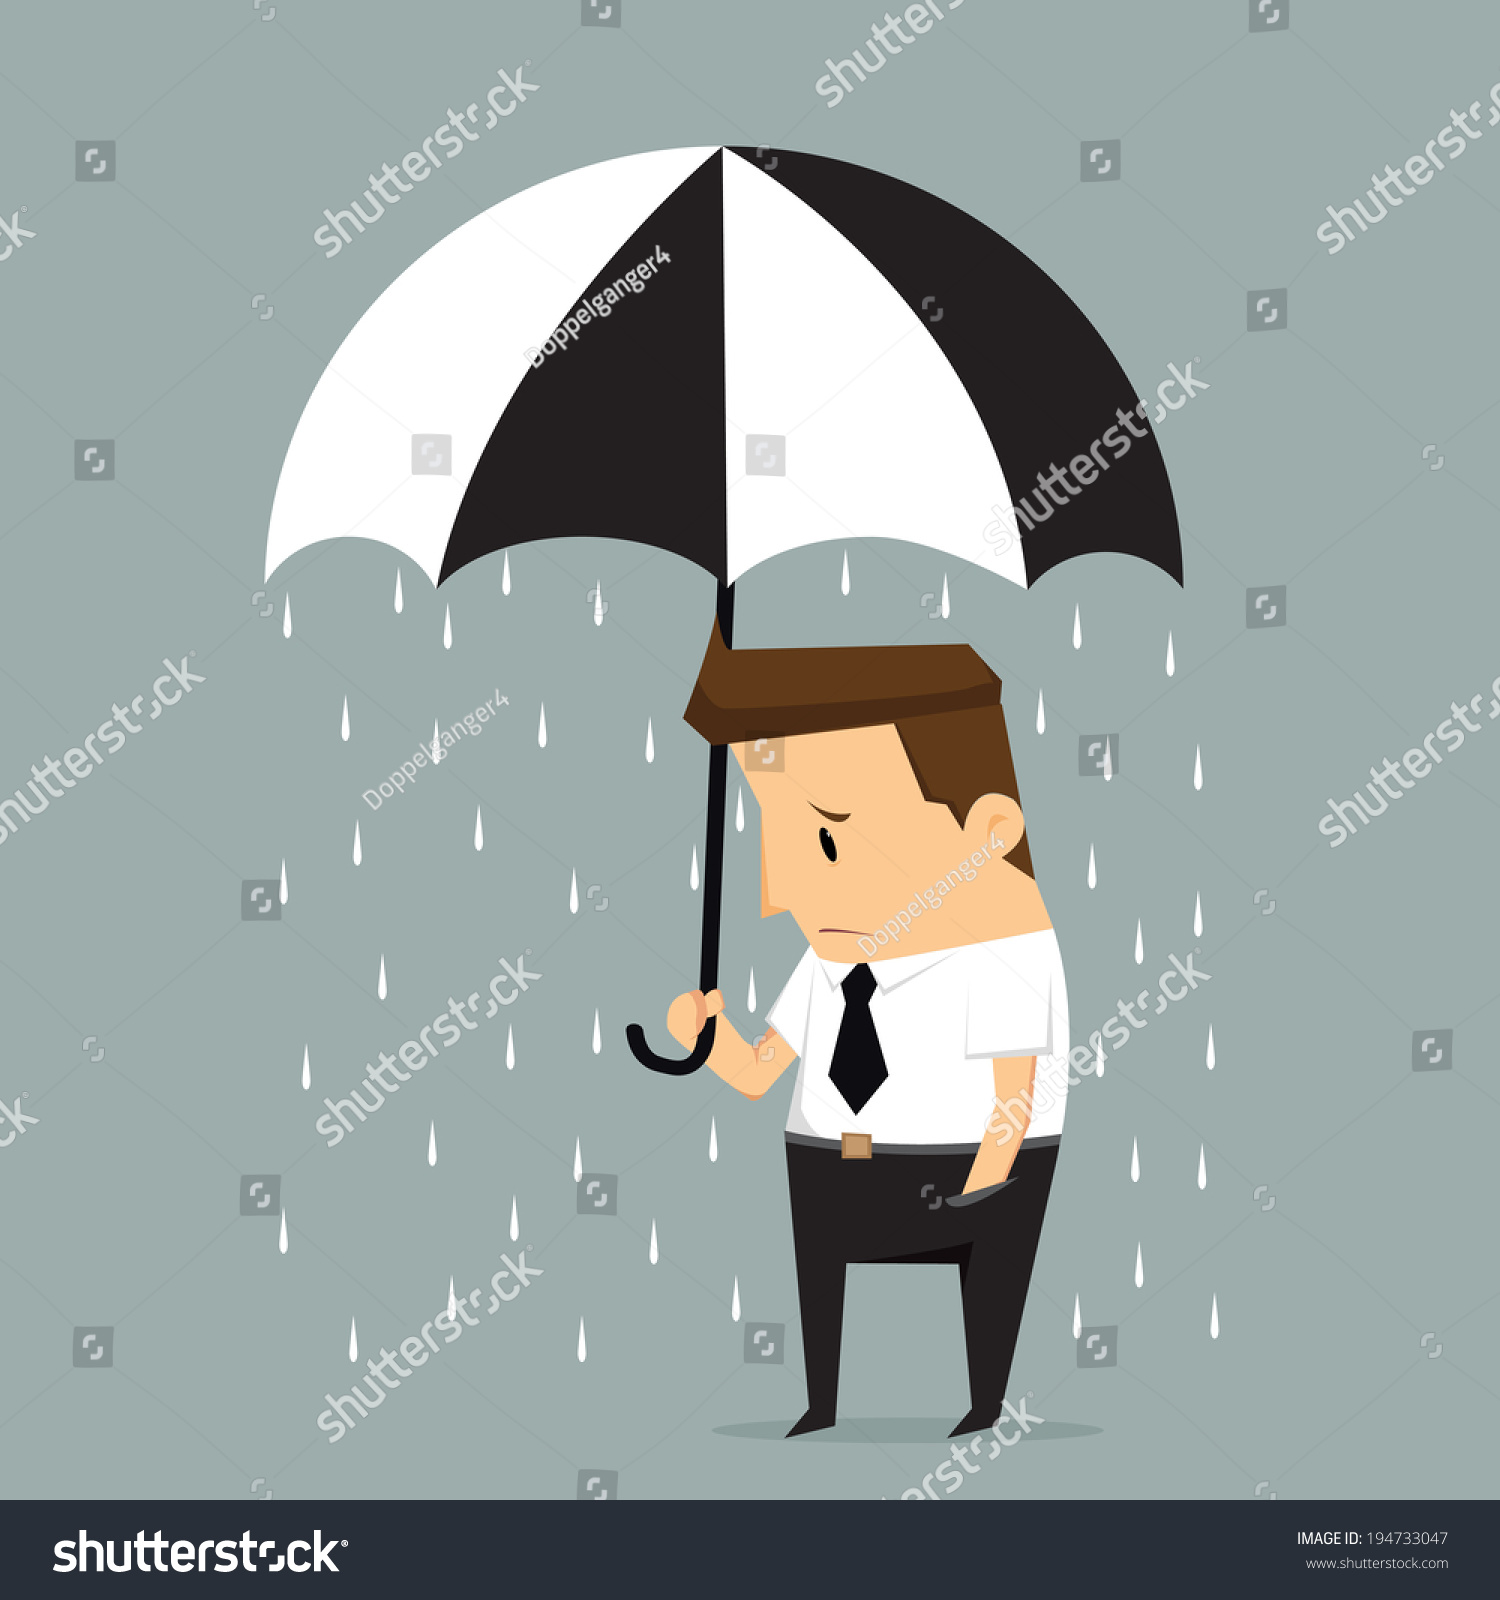 unlucky businessman being wet from raining instead he holding umbrella